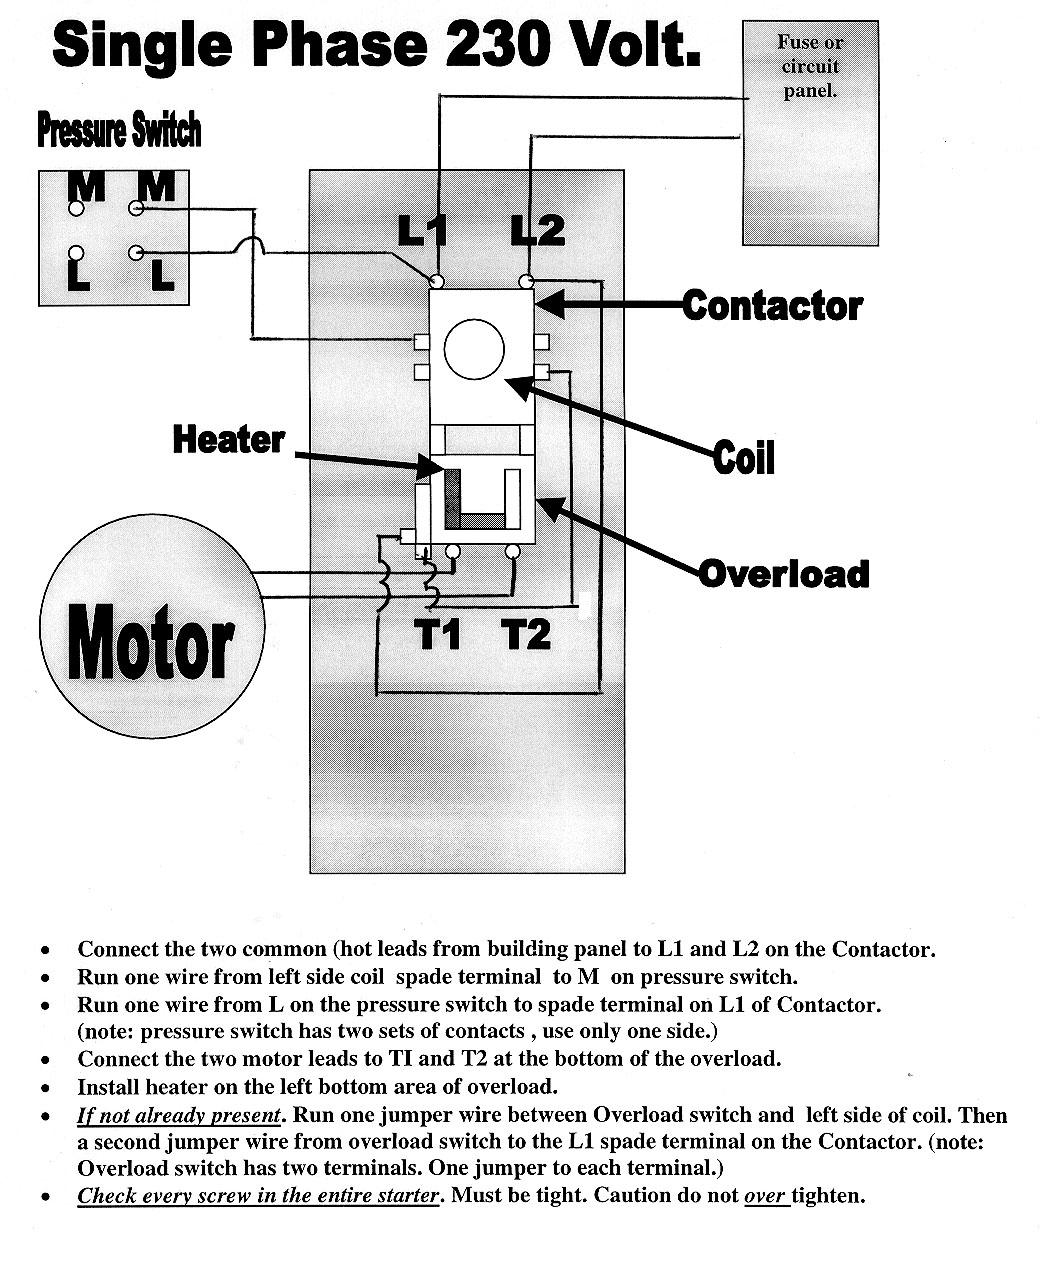 hight resolution of single phase marathon motor wiring diagram gallery